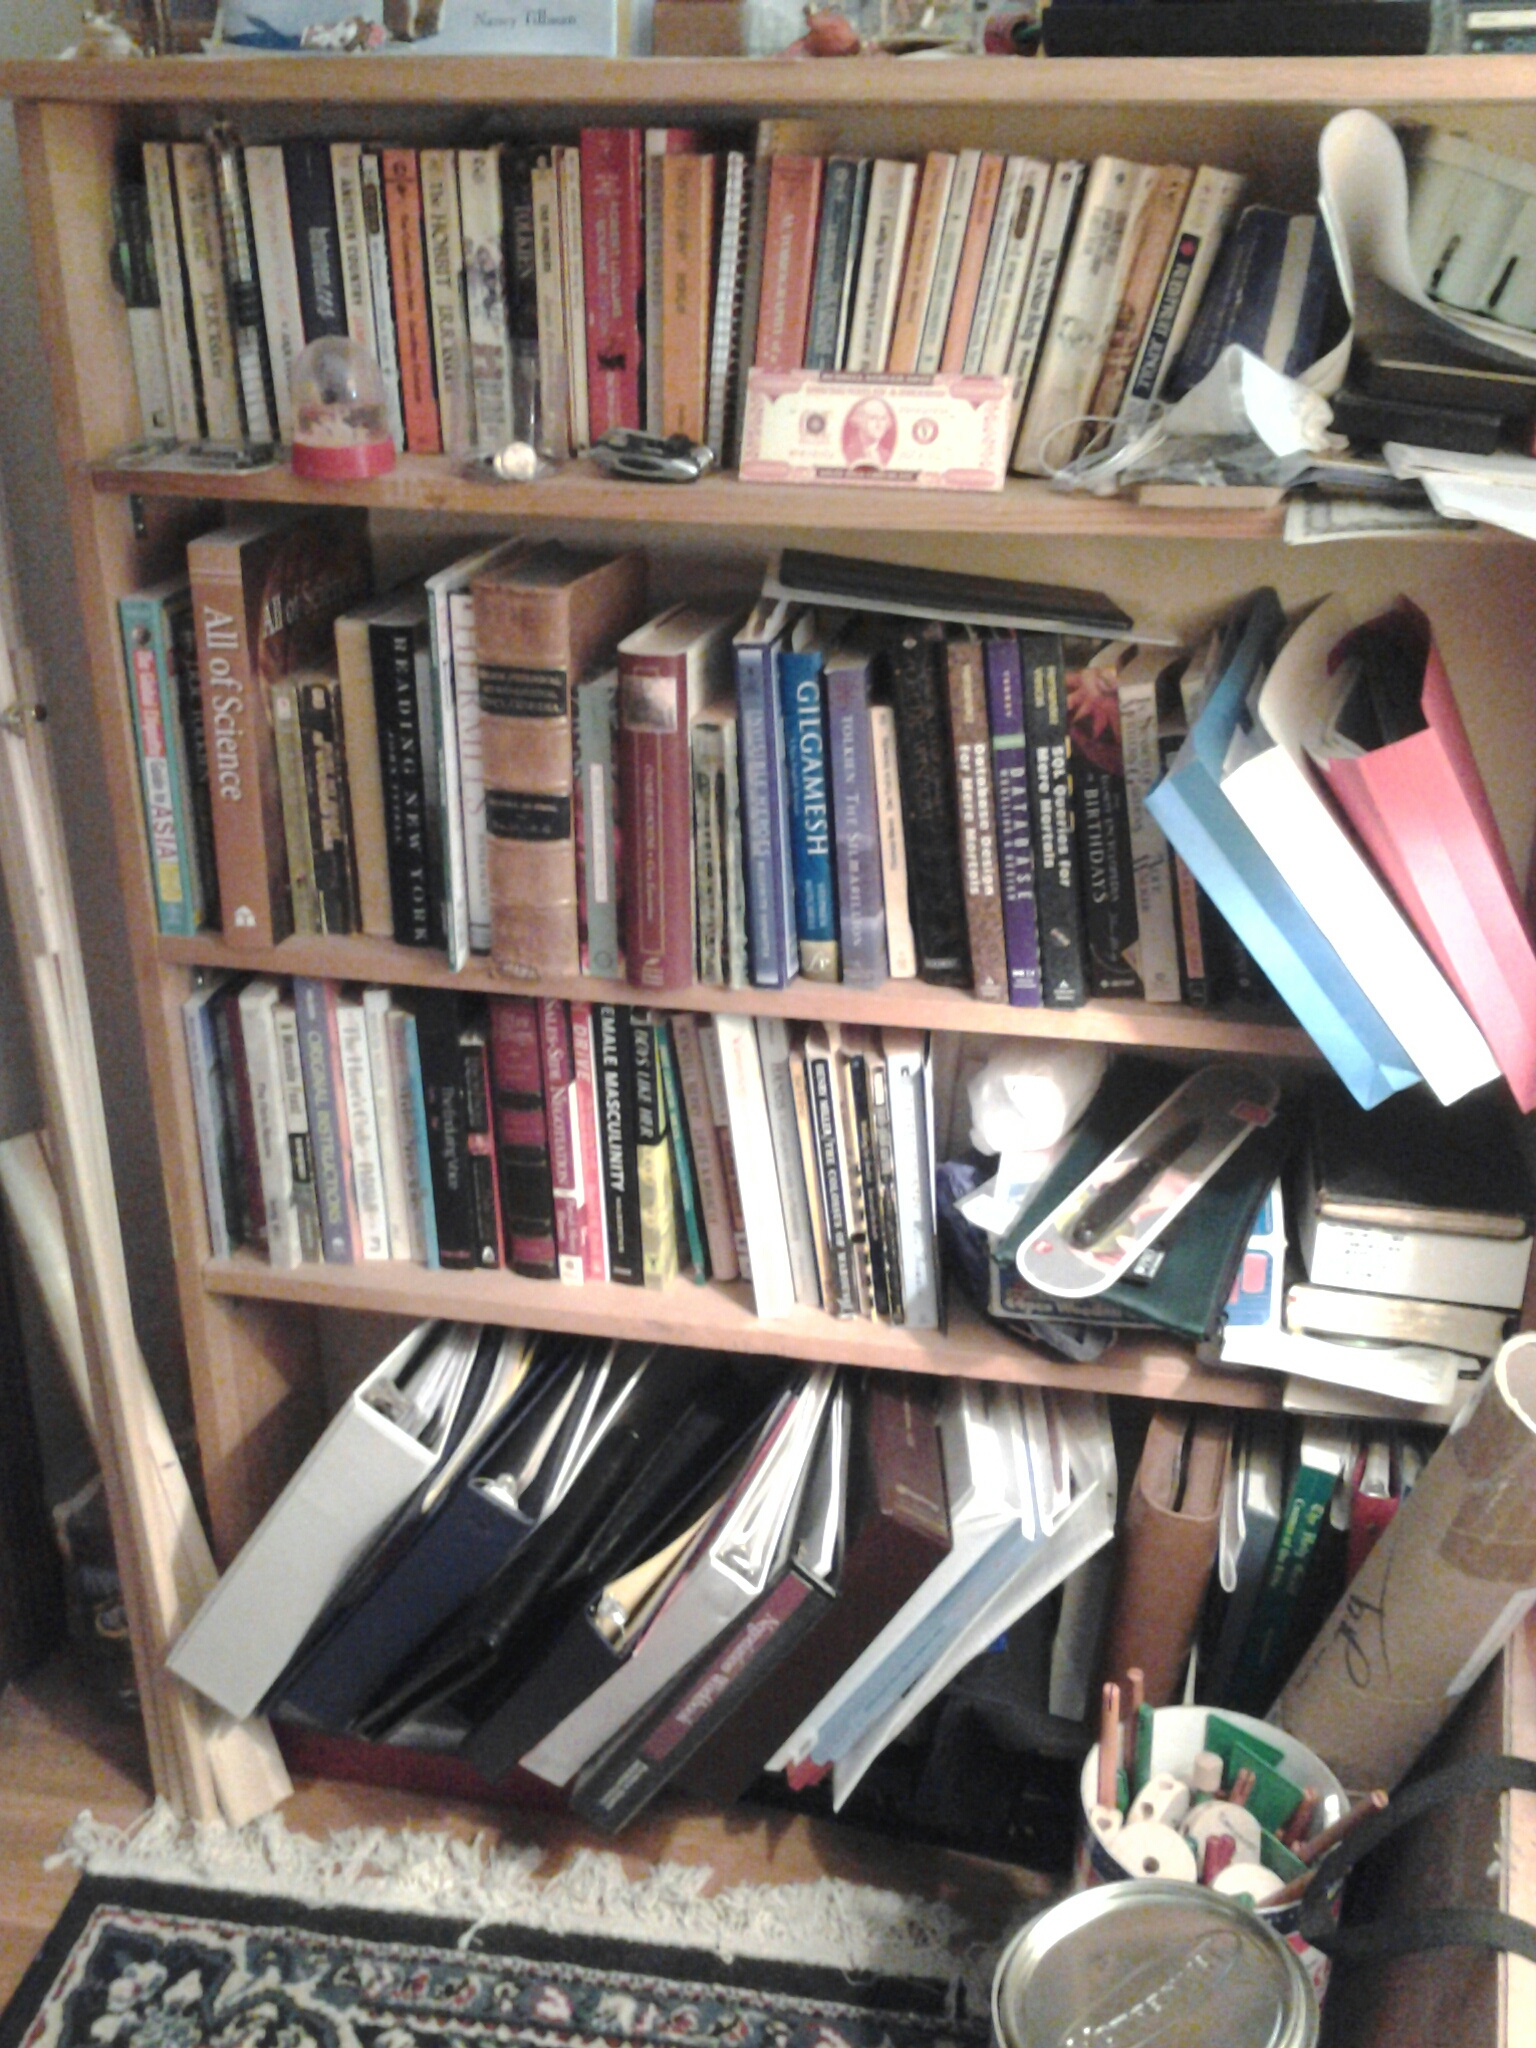 Bookshelf 6 - esoterica, financial, programming, fiction